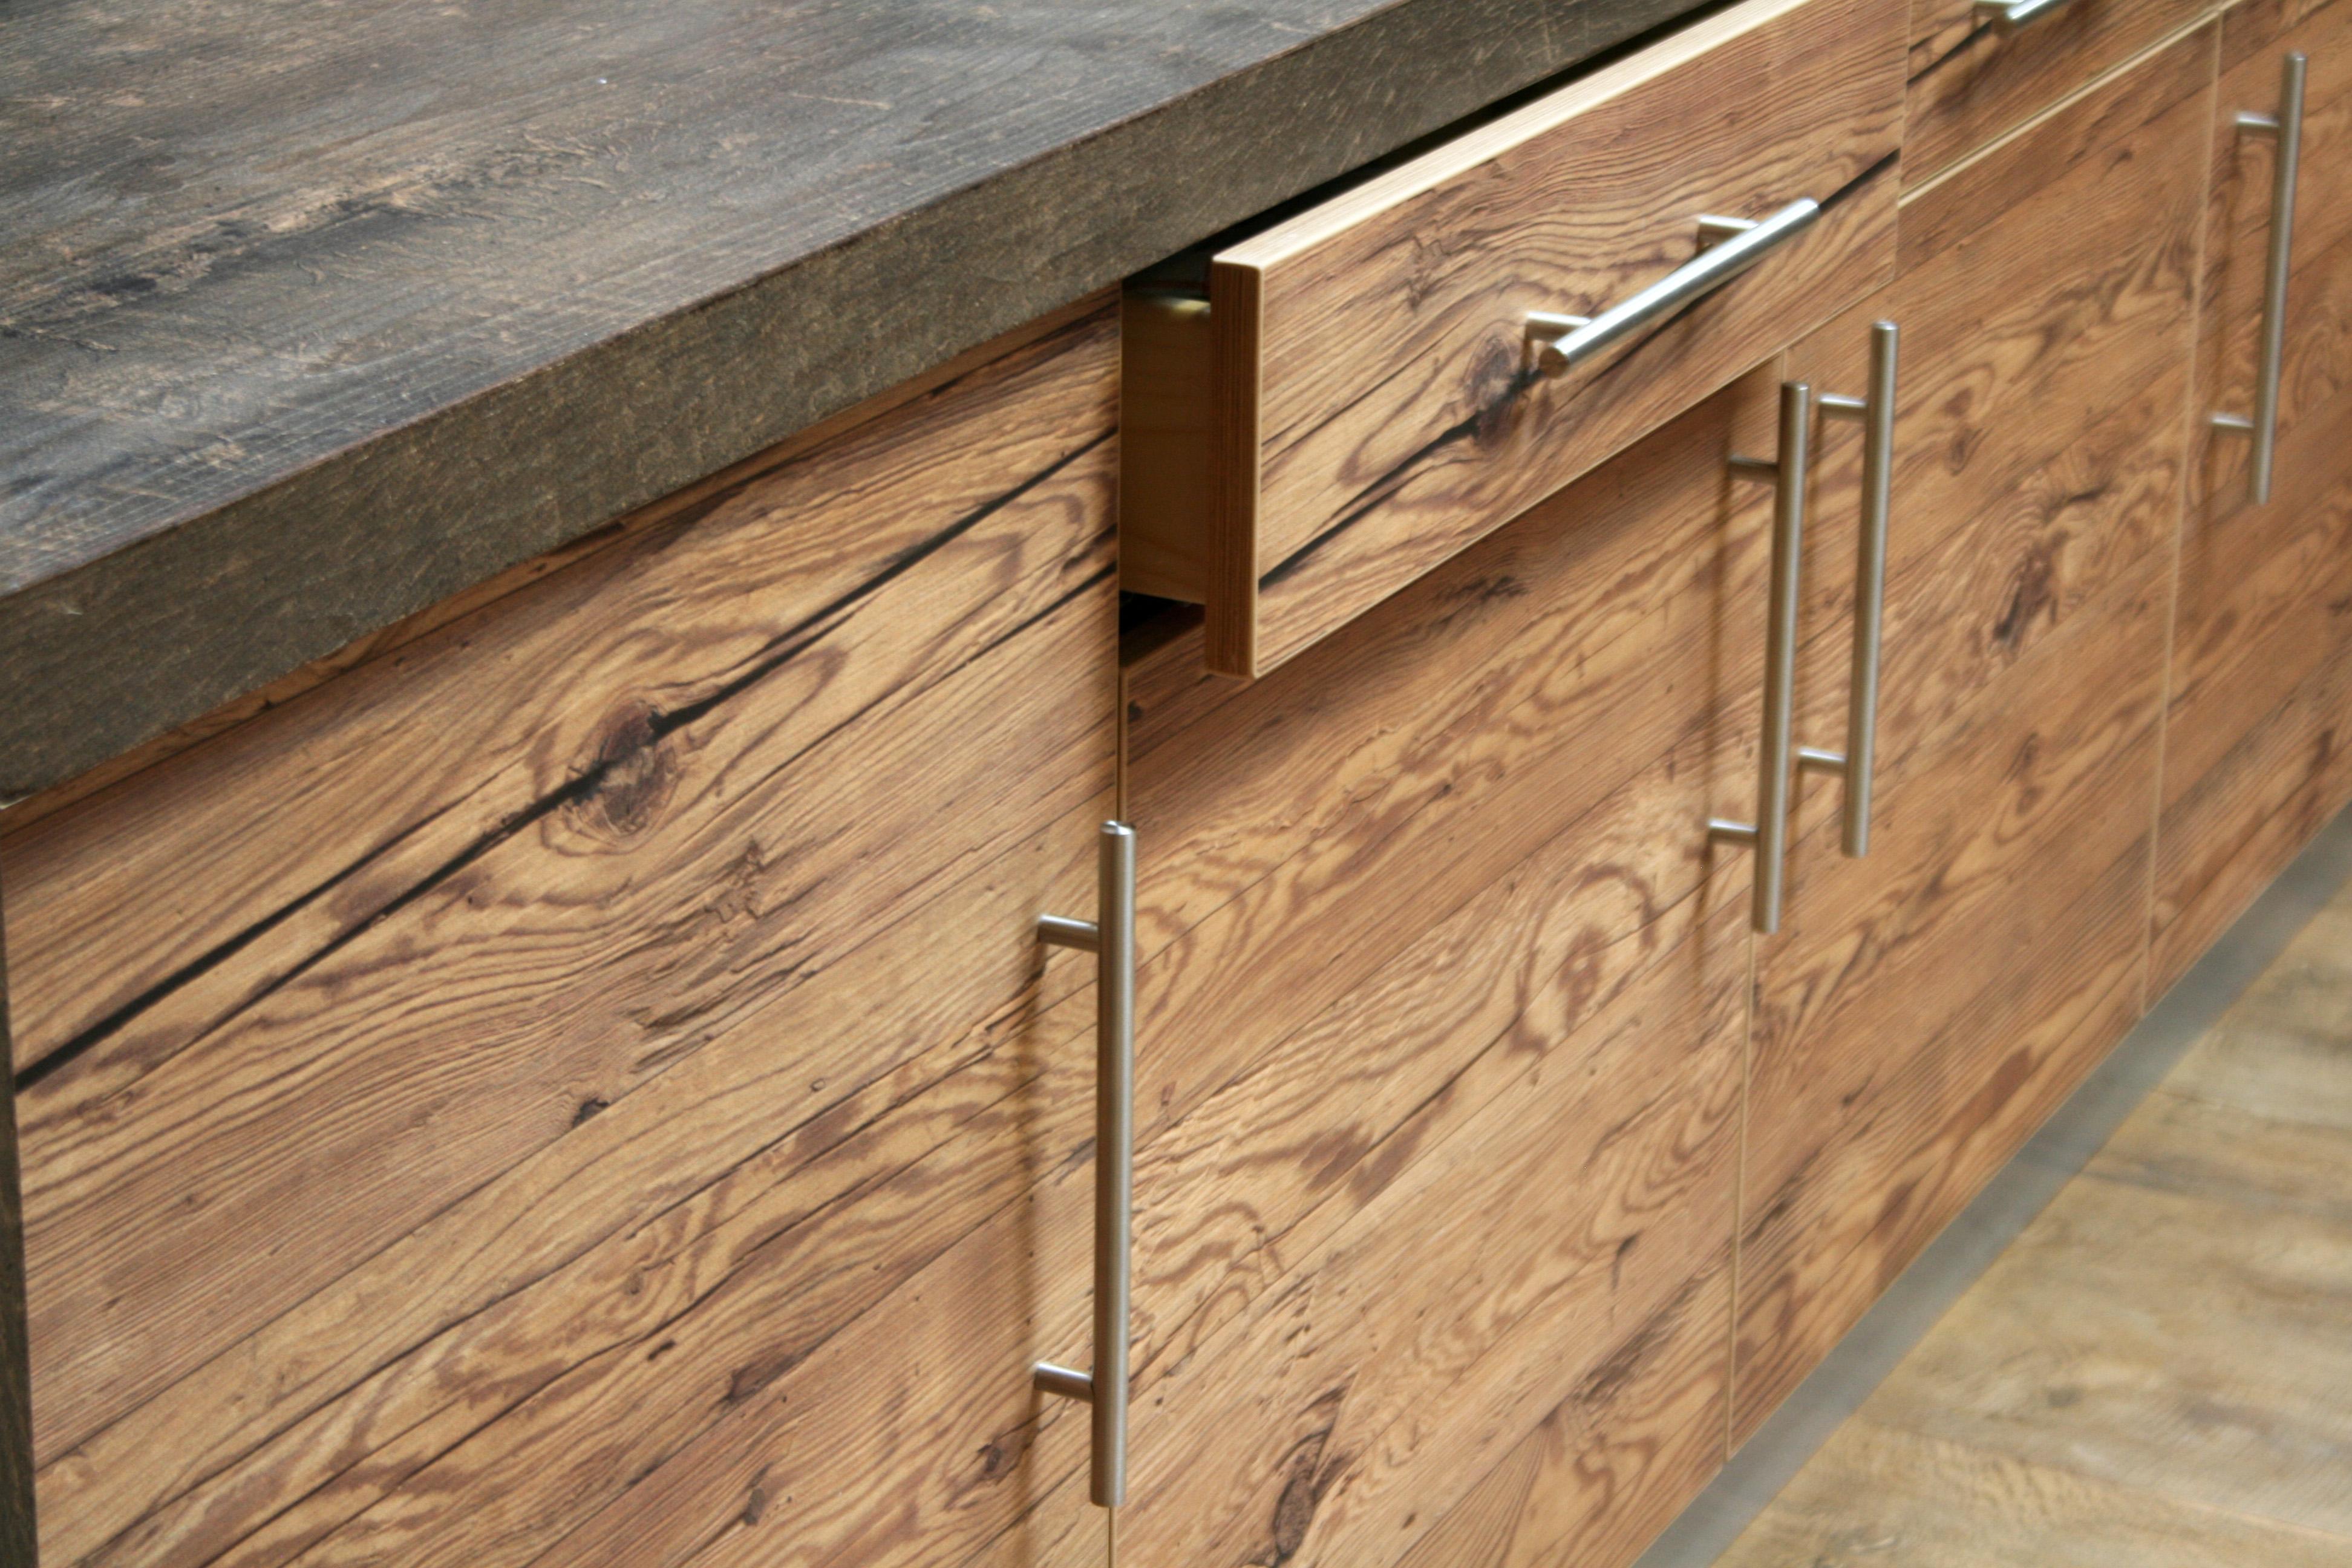 Acheter meuble en bois ancien vieux chene ou vieux sapin for Meuble cuisine ancien bois